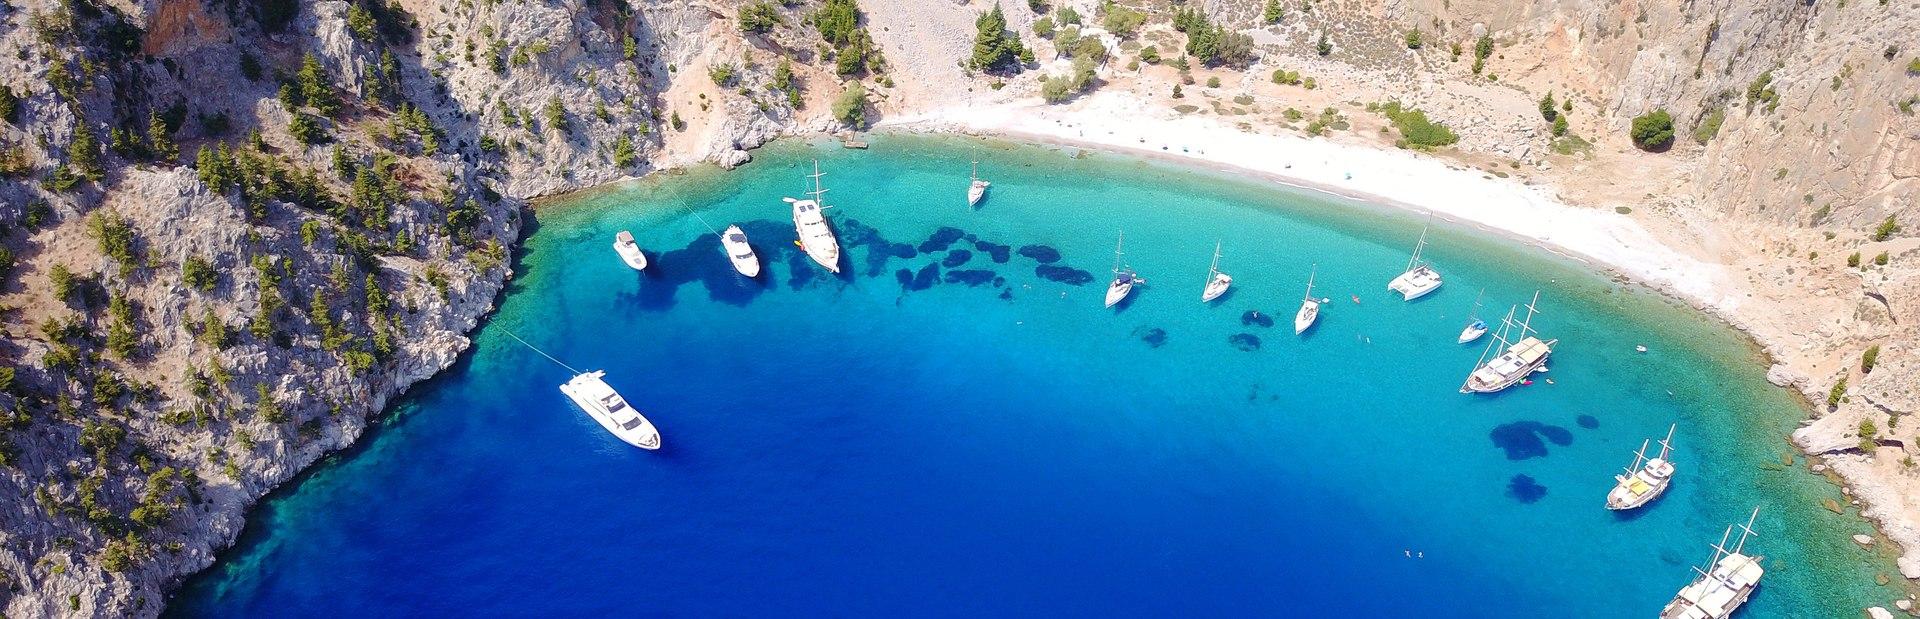 Agios Georgios Image 1